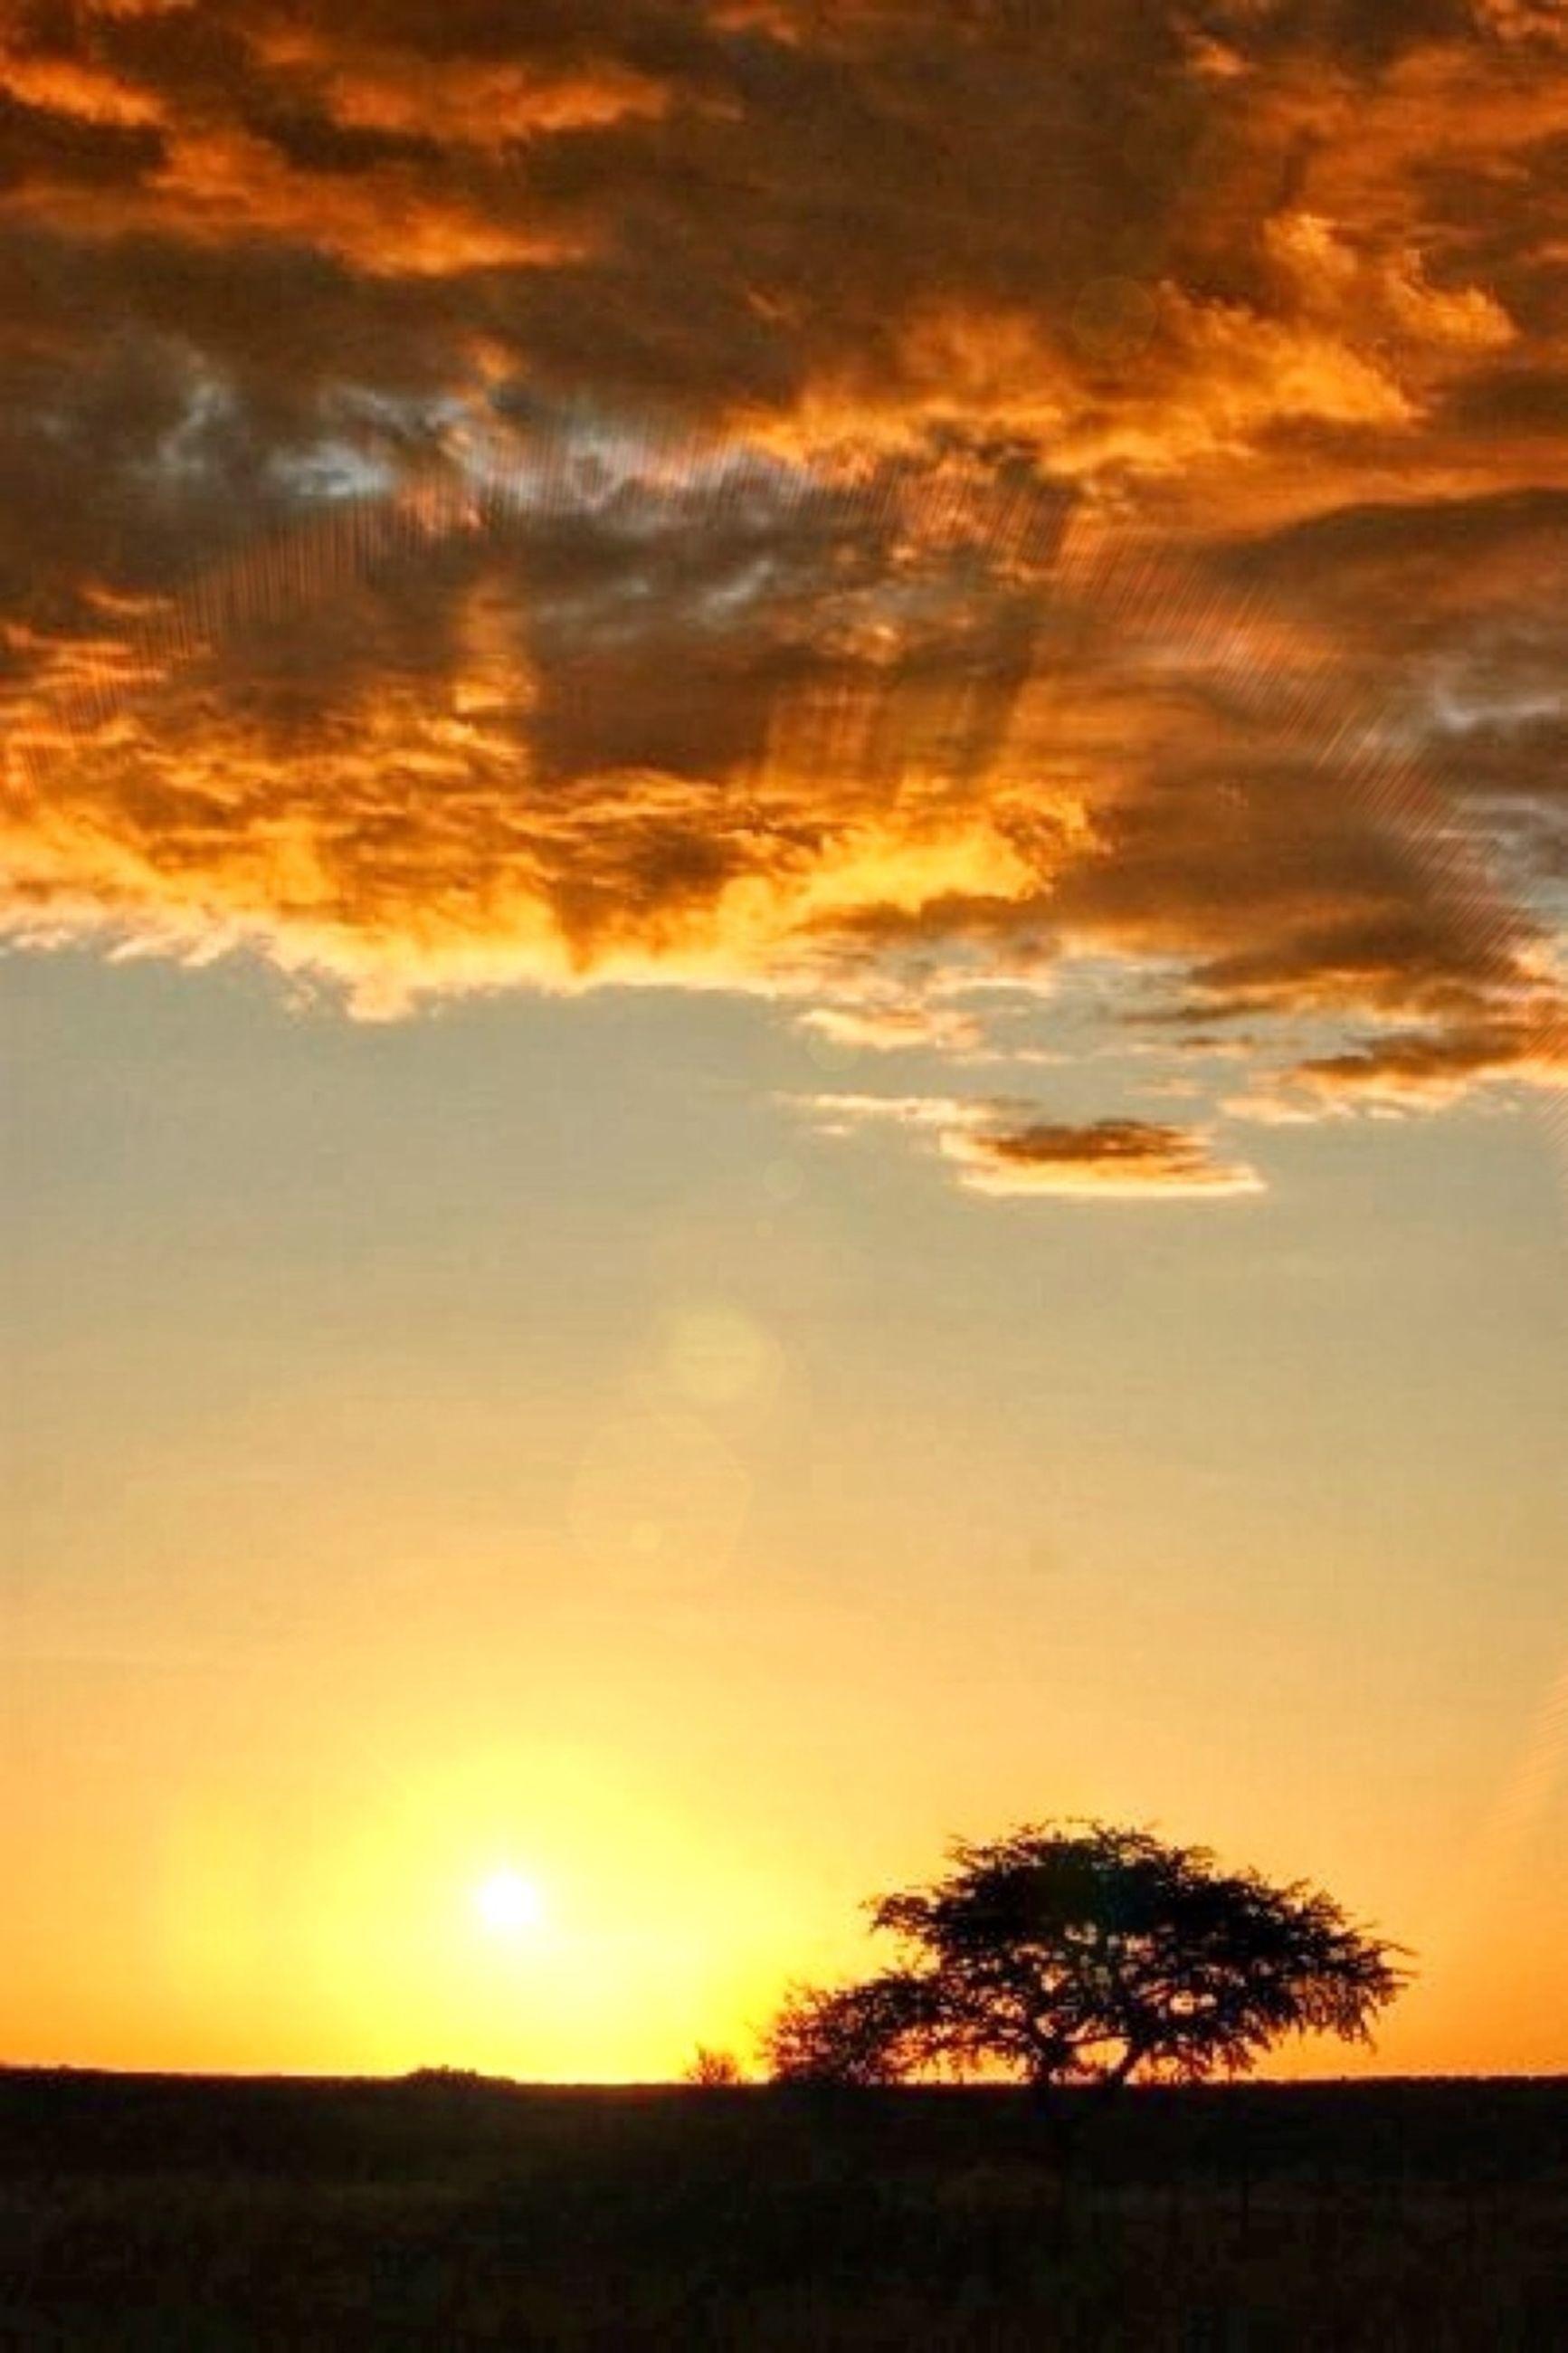 sunset, tranquil scene, scenics, orange color, tranquility, beauty in nature, sky, landscape, silhouette, idyllic, sun, nature, cloud - sky, field, tree, dramatic sky, horizon over land, cloud, non-urban scene, sunlight